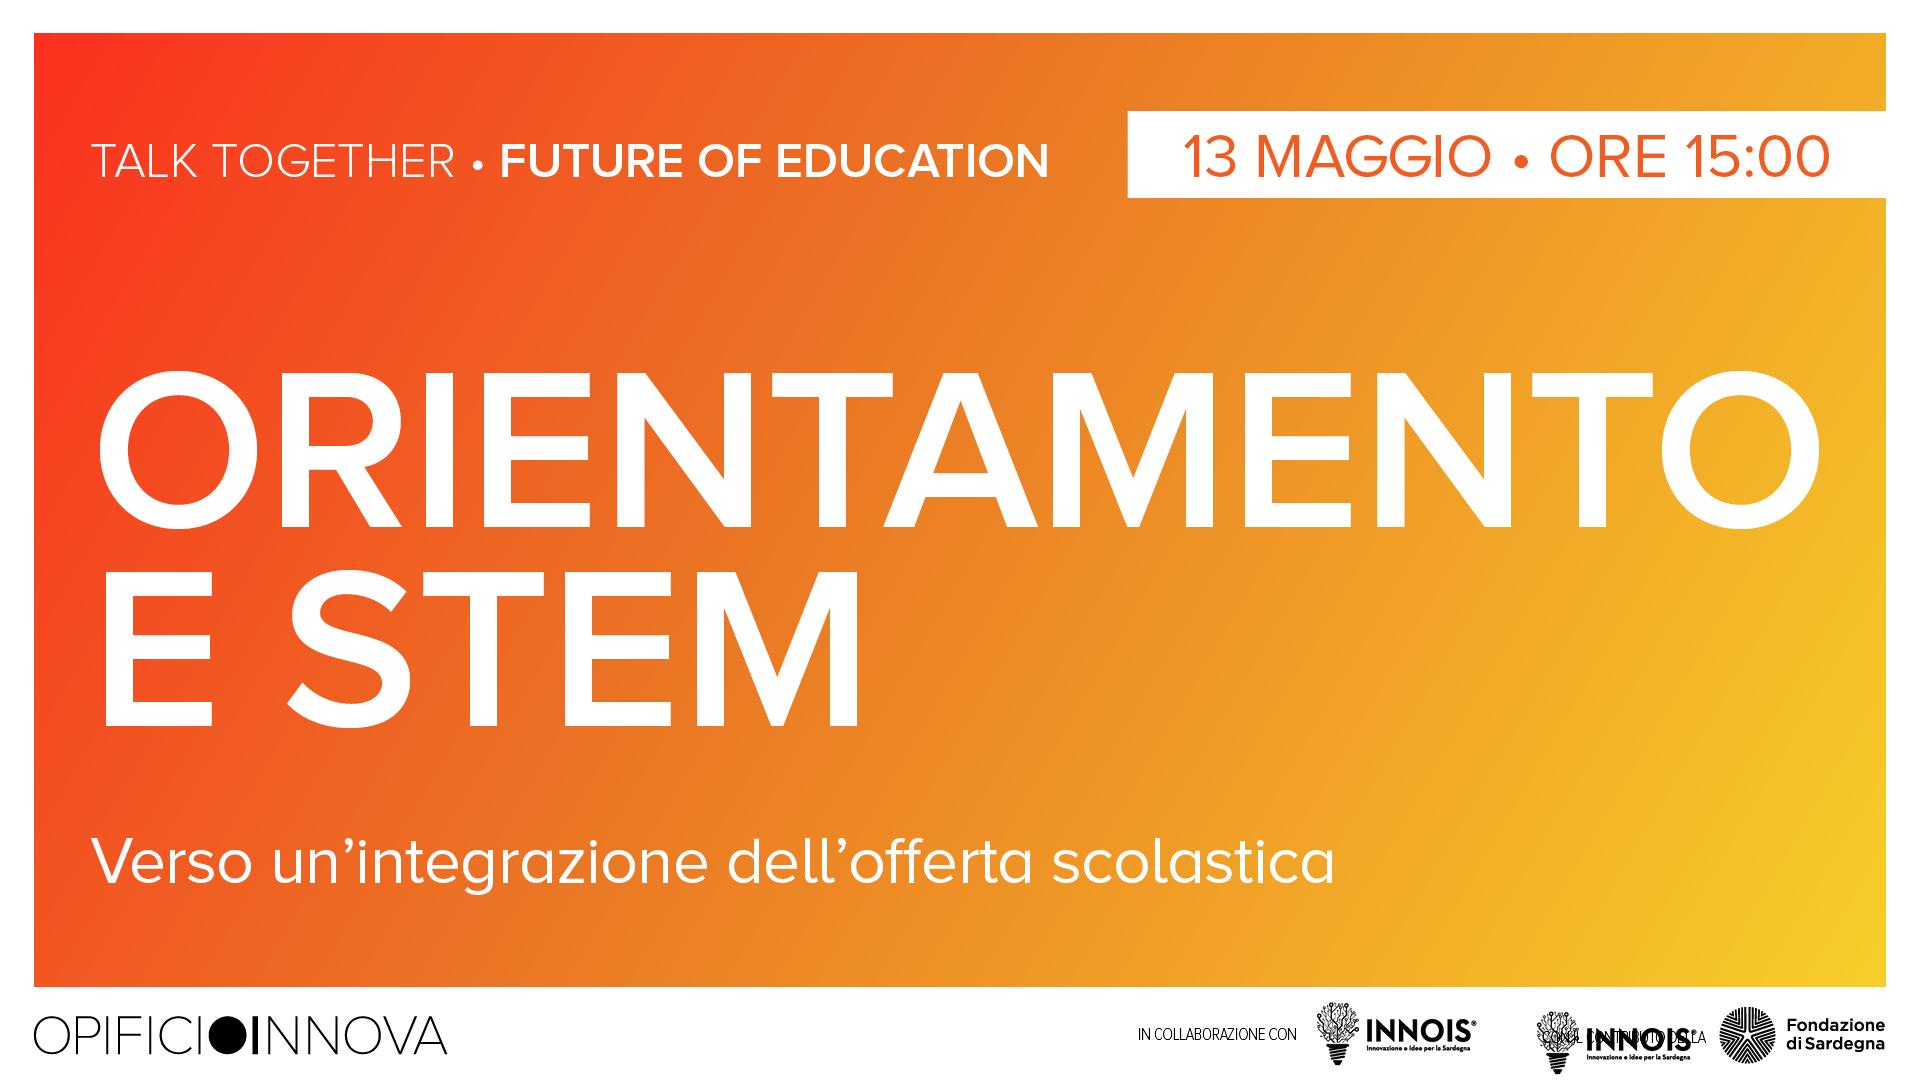 Orientamento e STEM </br>13-05-2021 ore 15:00